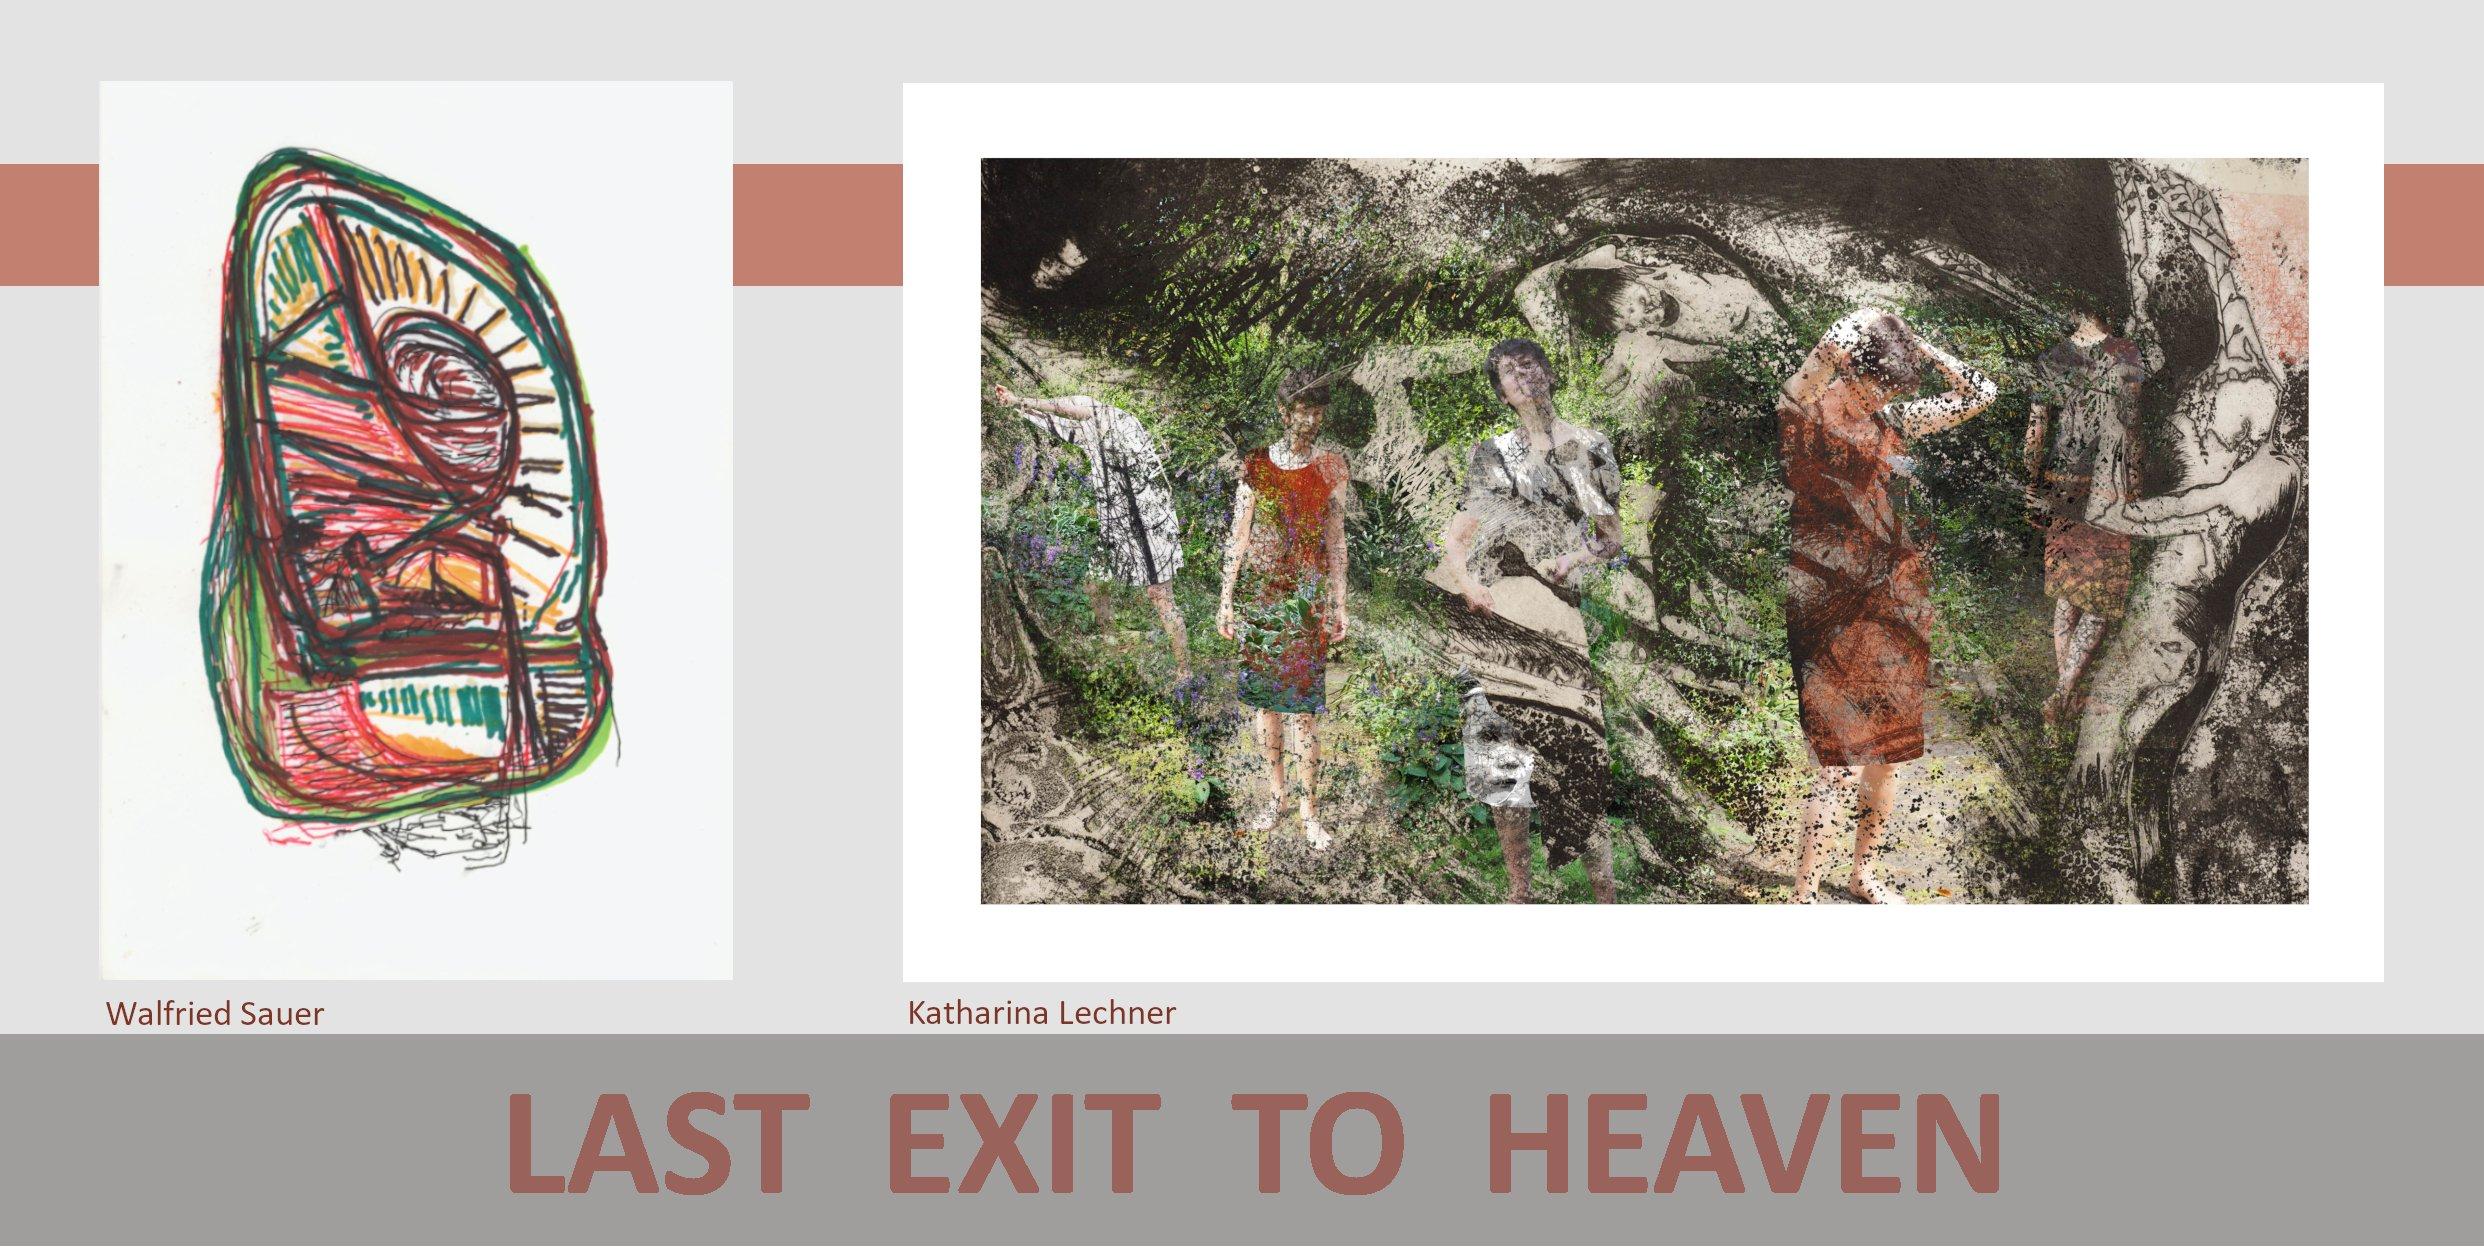 LAST EXIT TO HEAVEN